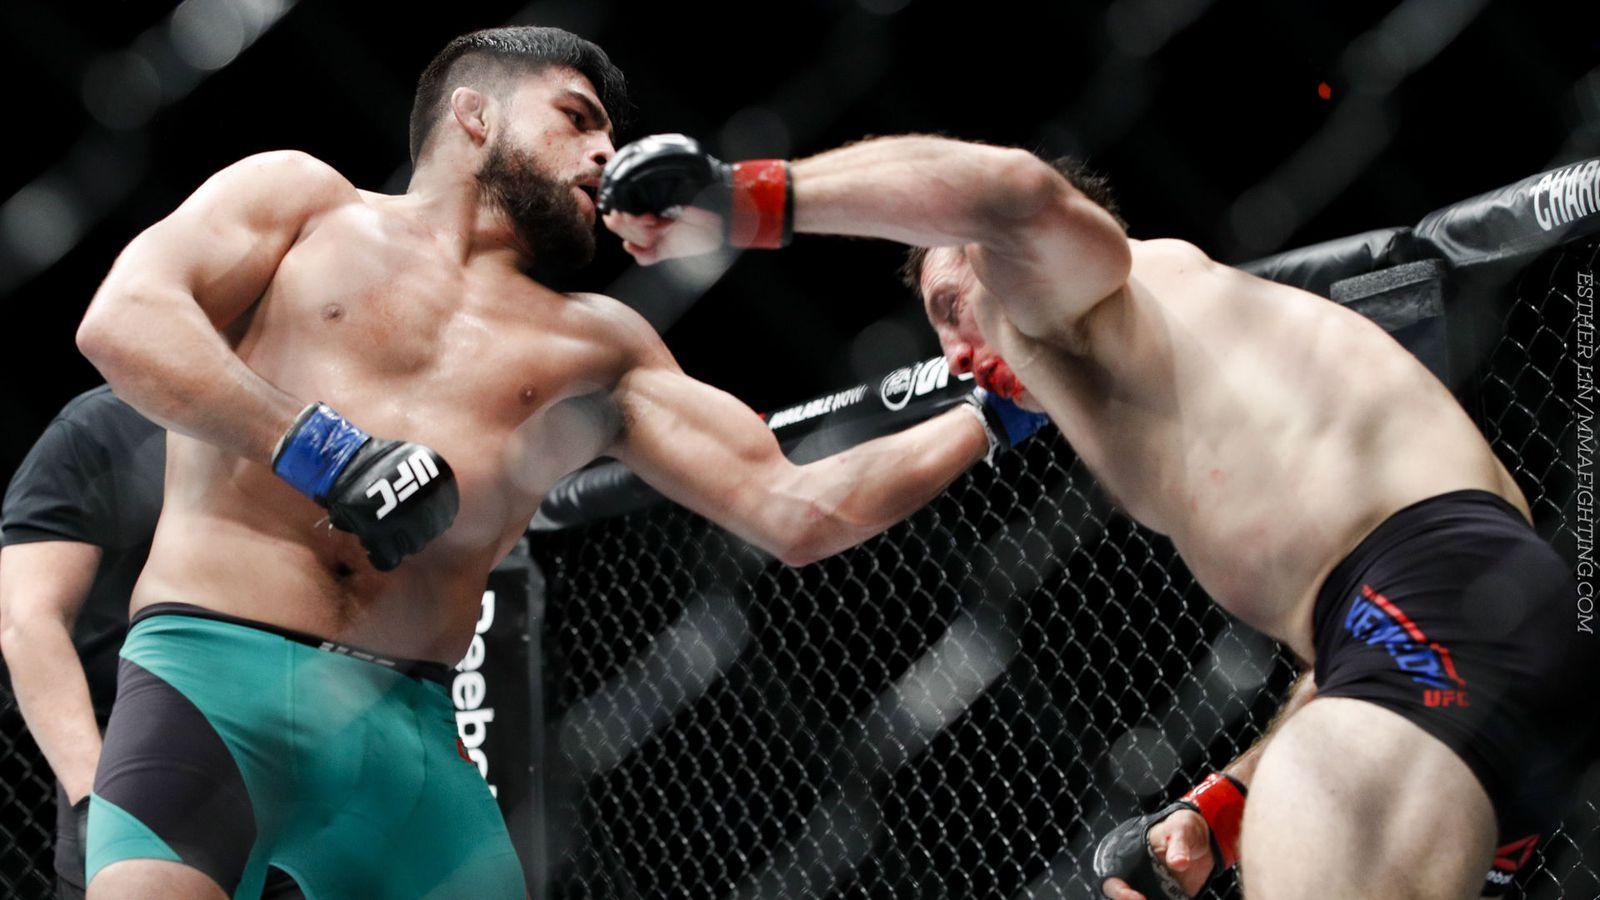 Mma fight cindy vs headgear guy 8